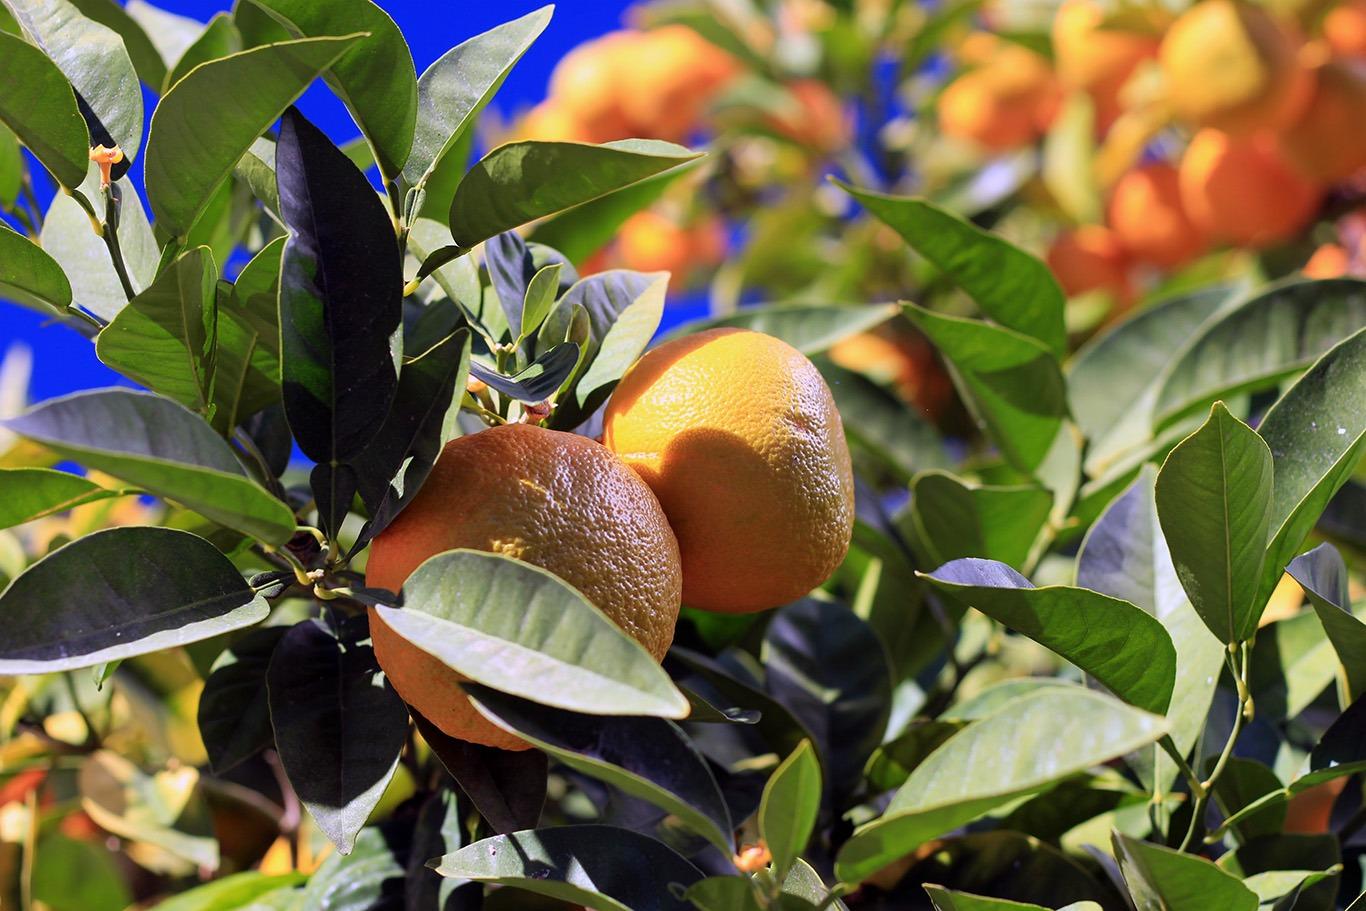 Севільські апельсини